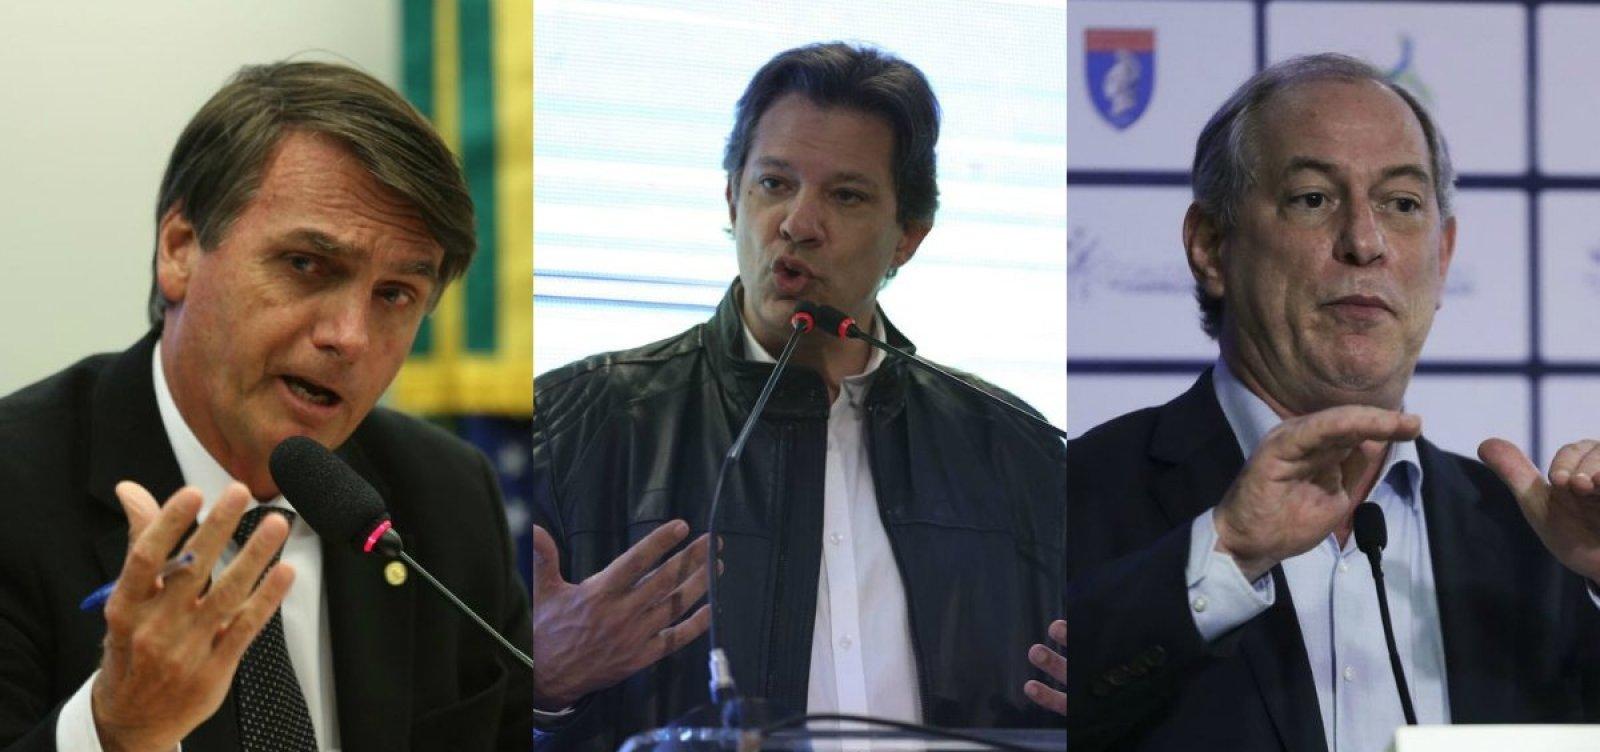 Datafolha: Bolsonaro chega a 28% e Haddad sobe para 16%; Ciro lidera no 2º turno